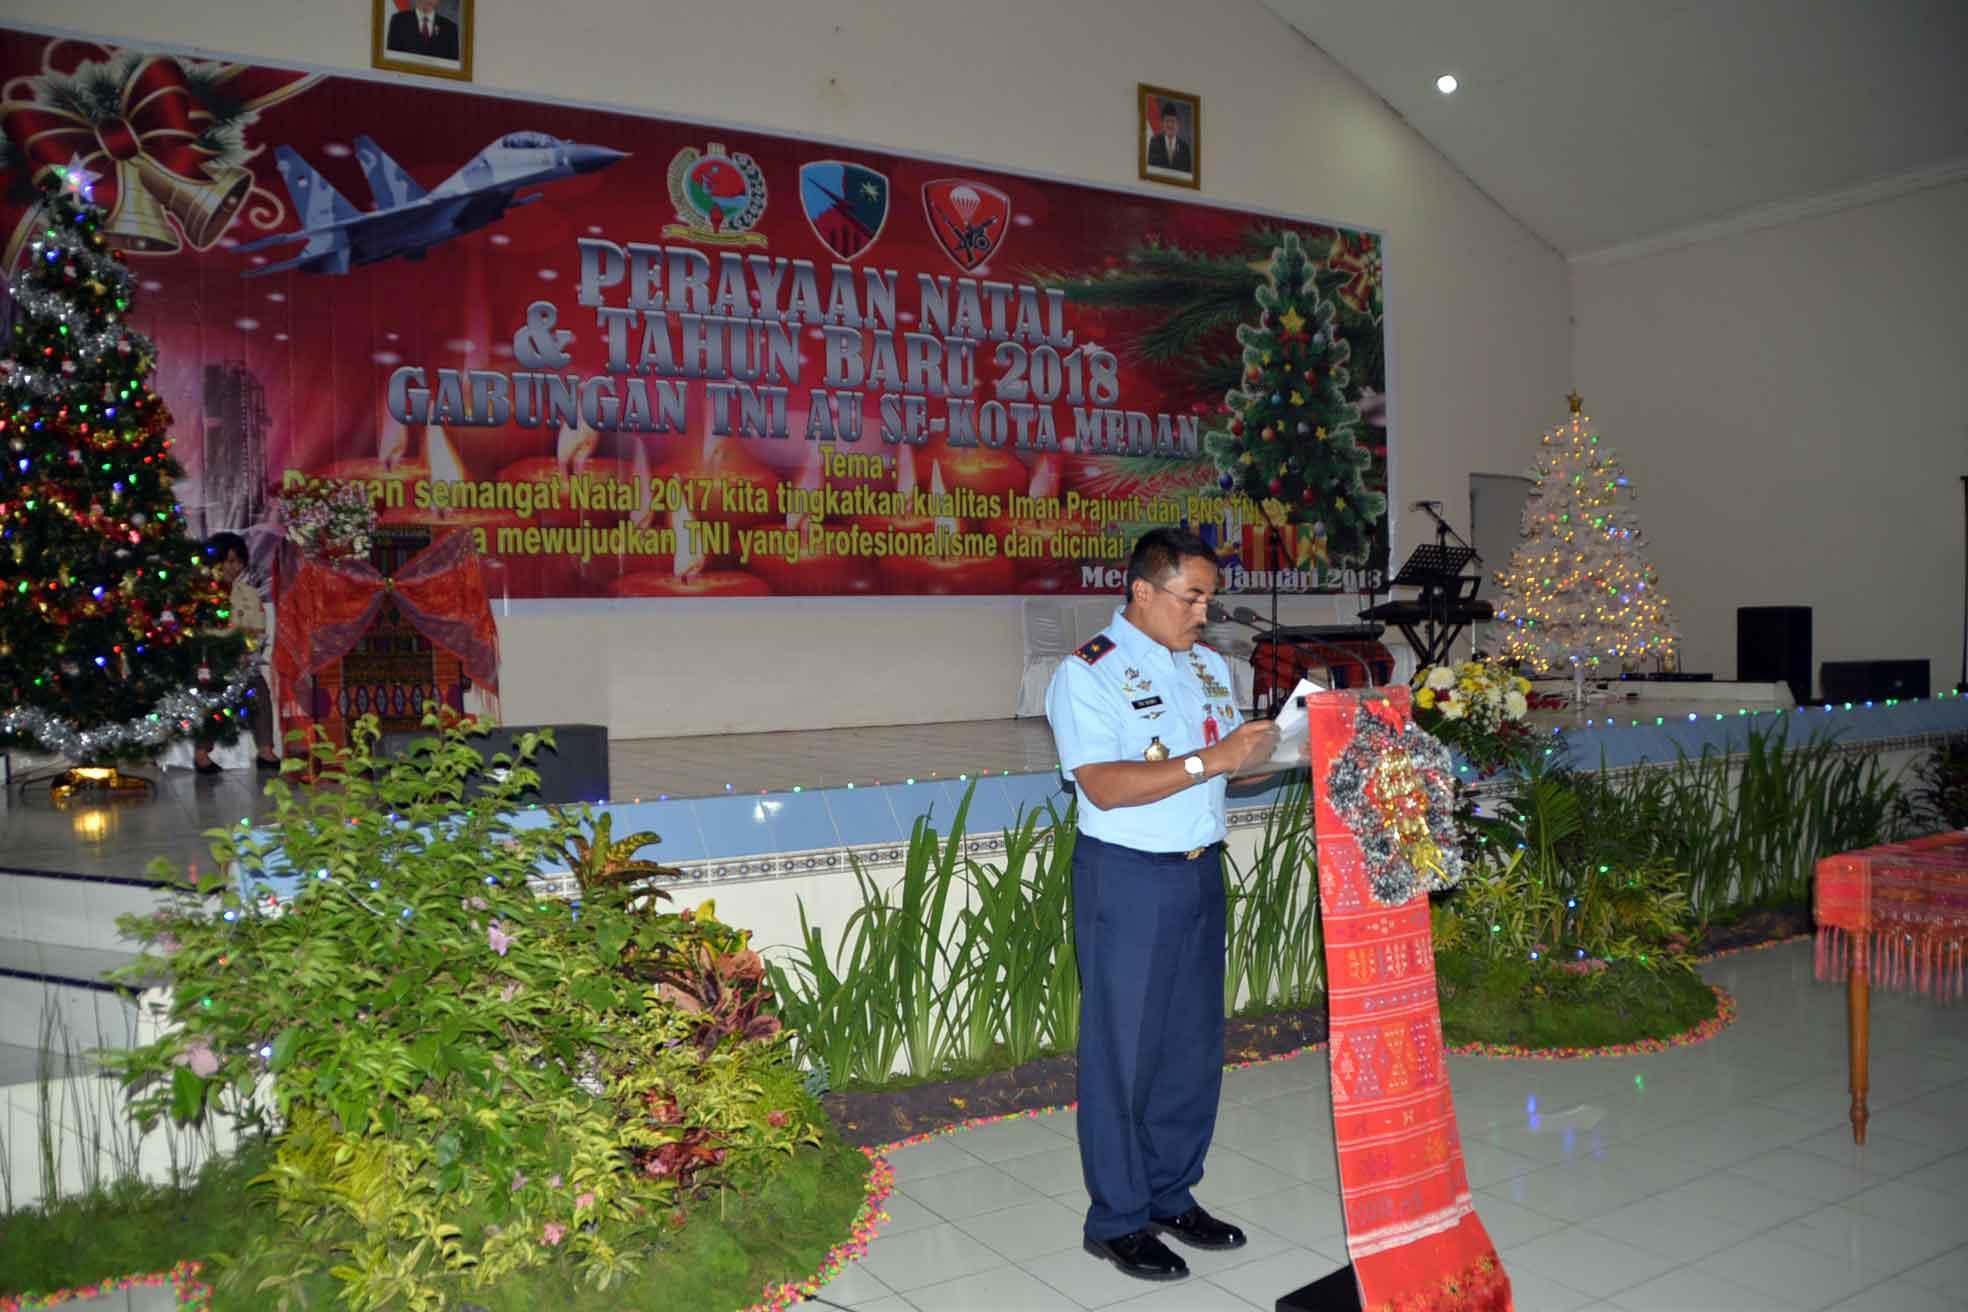 Perayaan Natal Bersama Keluarga Besar TNI AU Se-Kota Medan